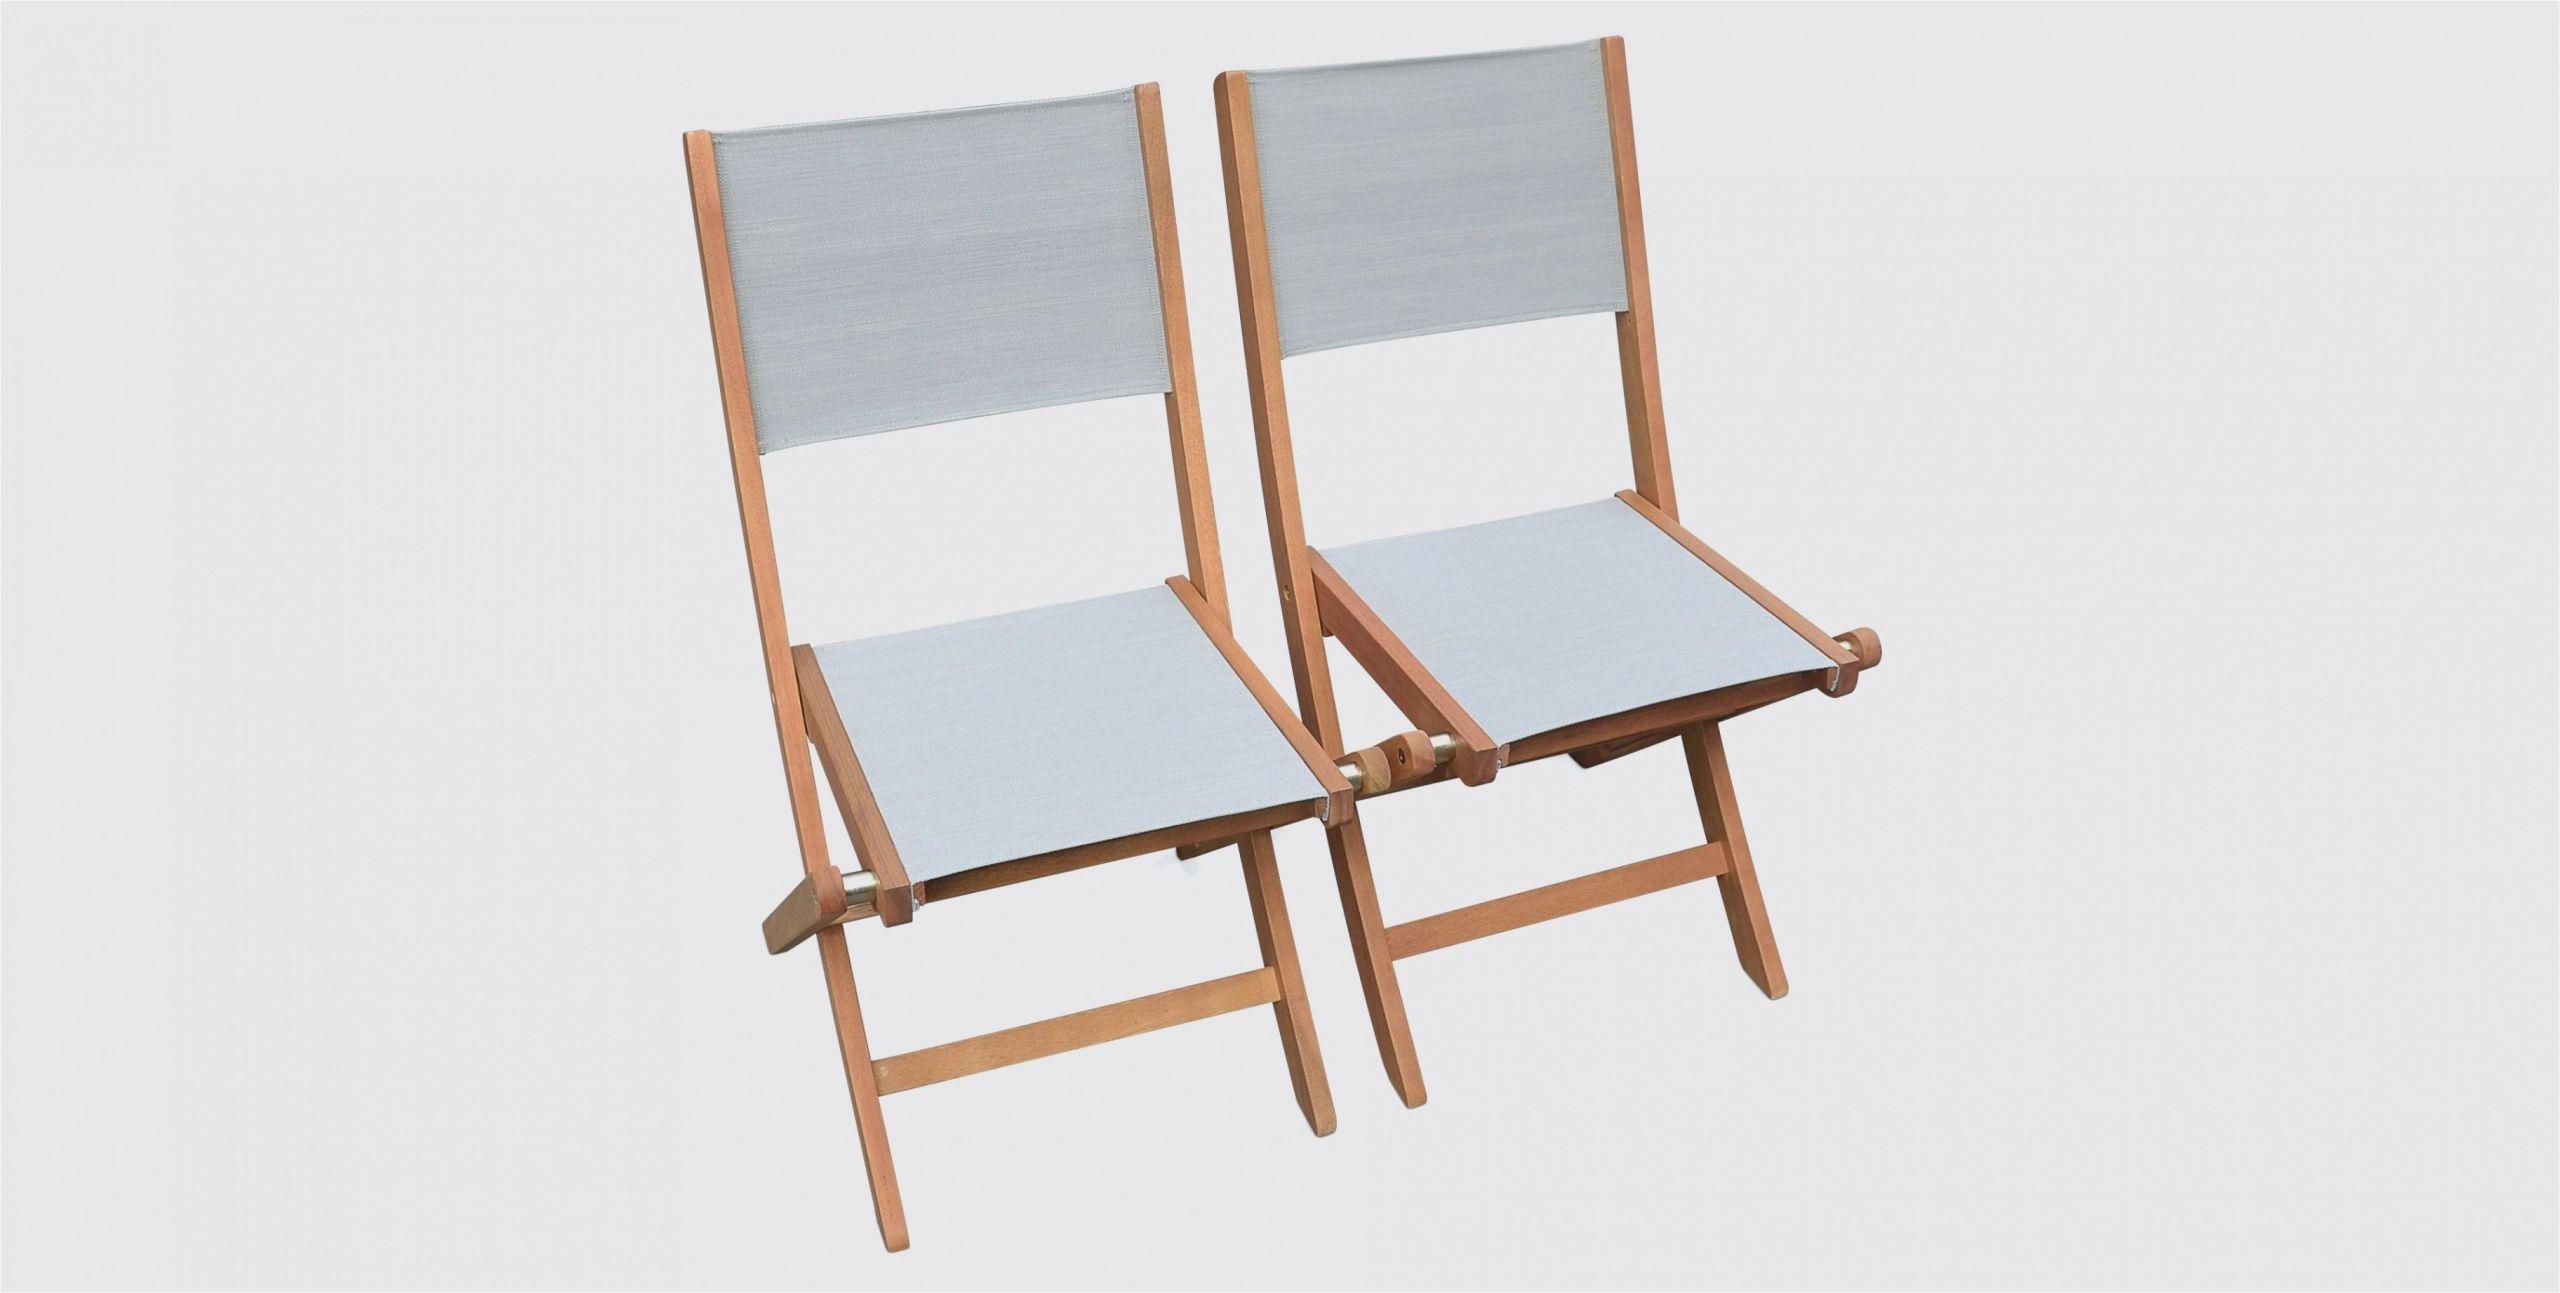 support hamac bois castorama genial transat chaise longue jardin chaise longue de jardin chaise style 0d galerie of support hamac bois castorama